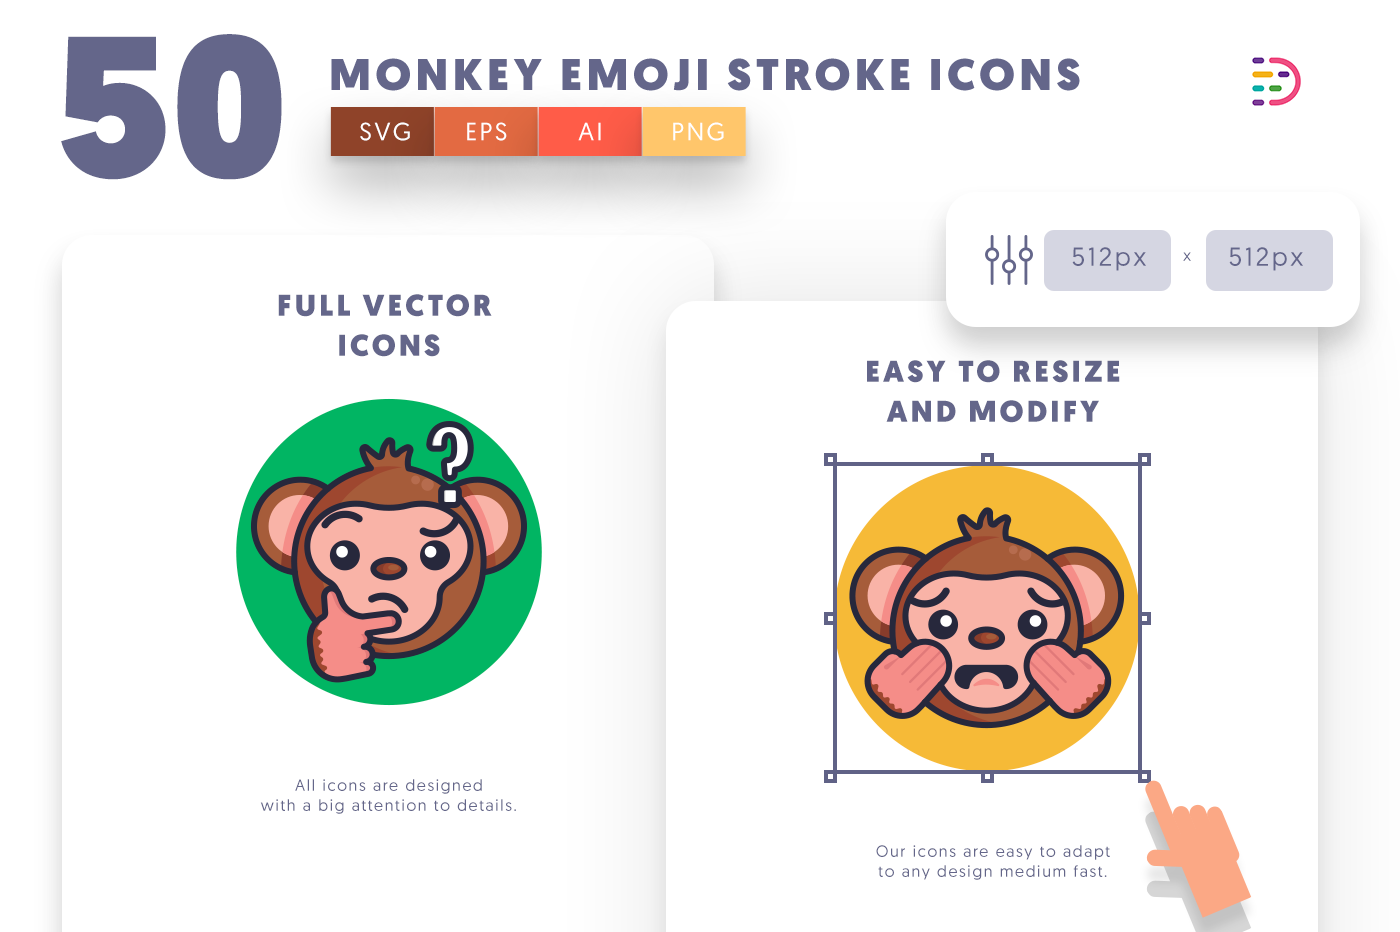 Full vector 50MonkeyEmojiStroke Icons